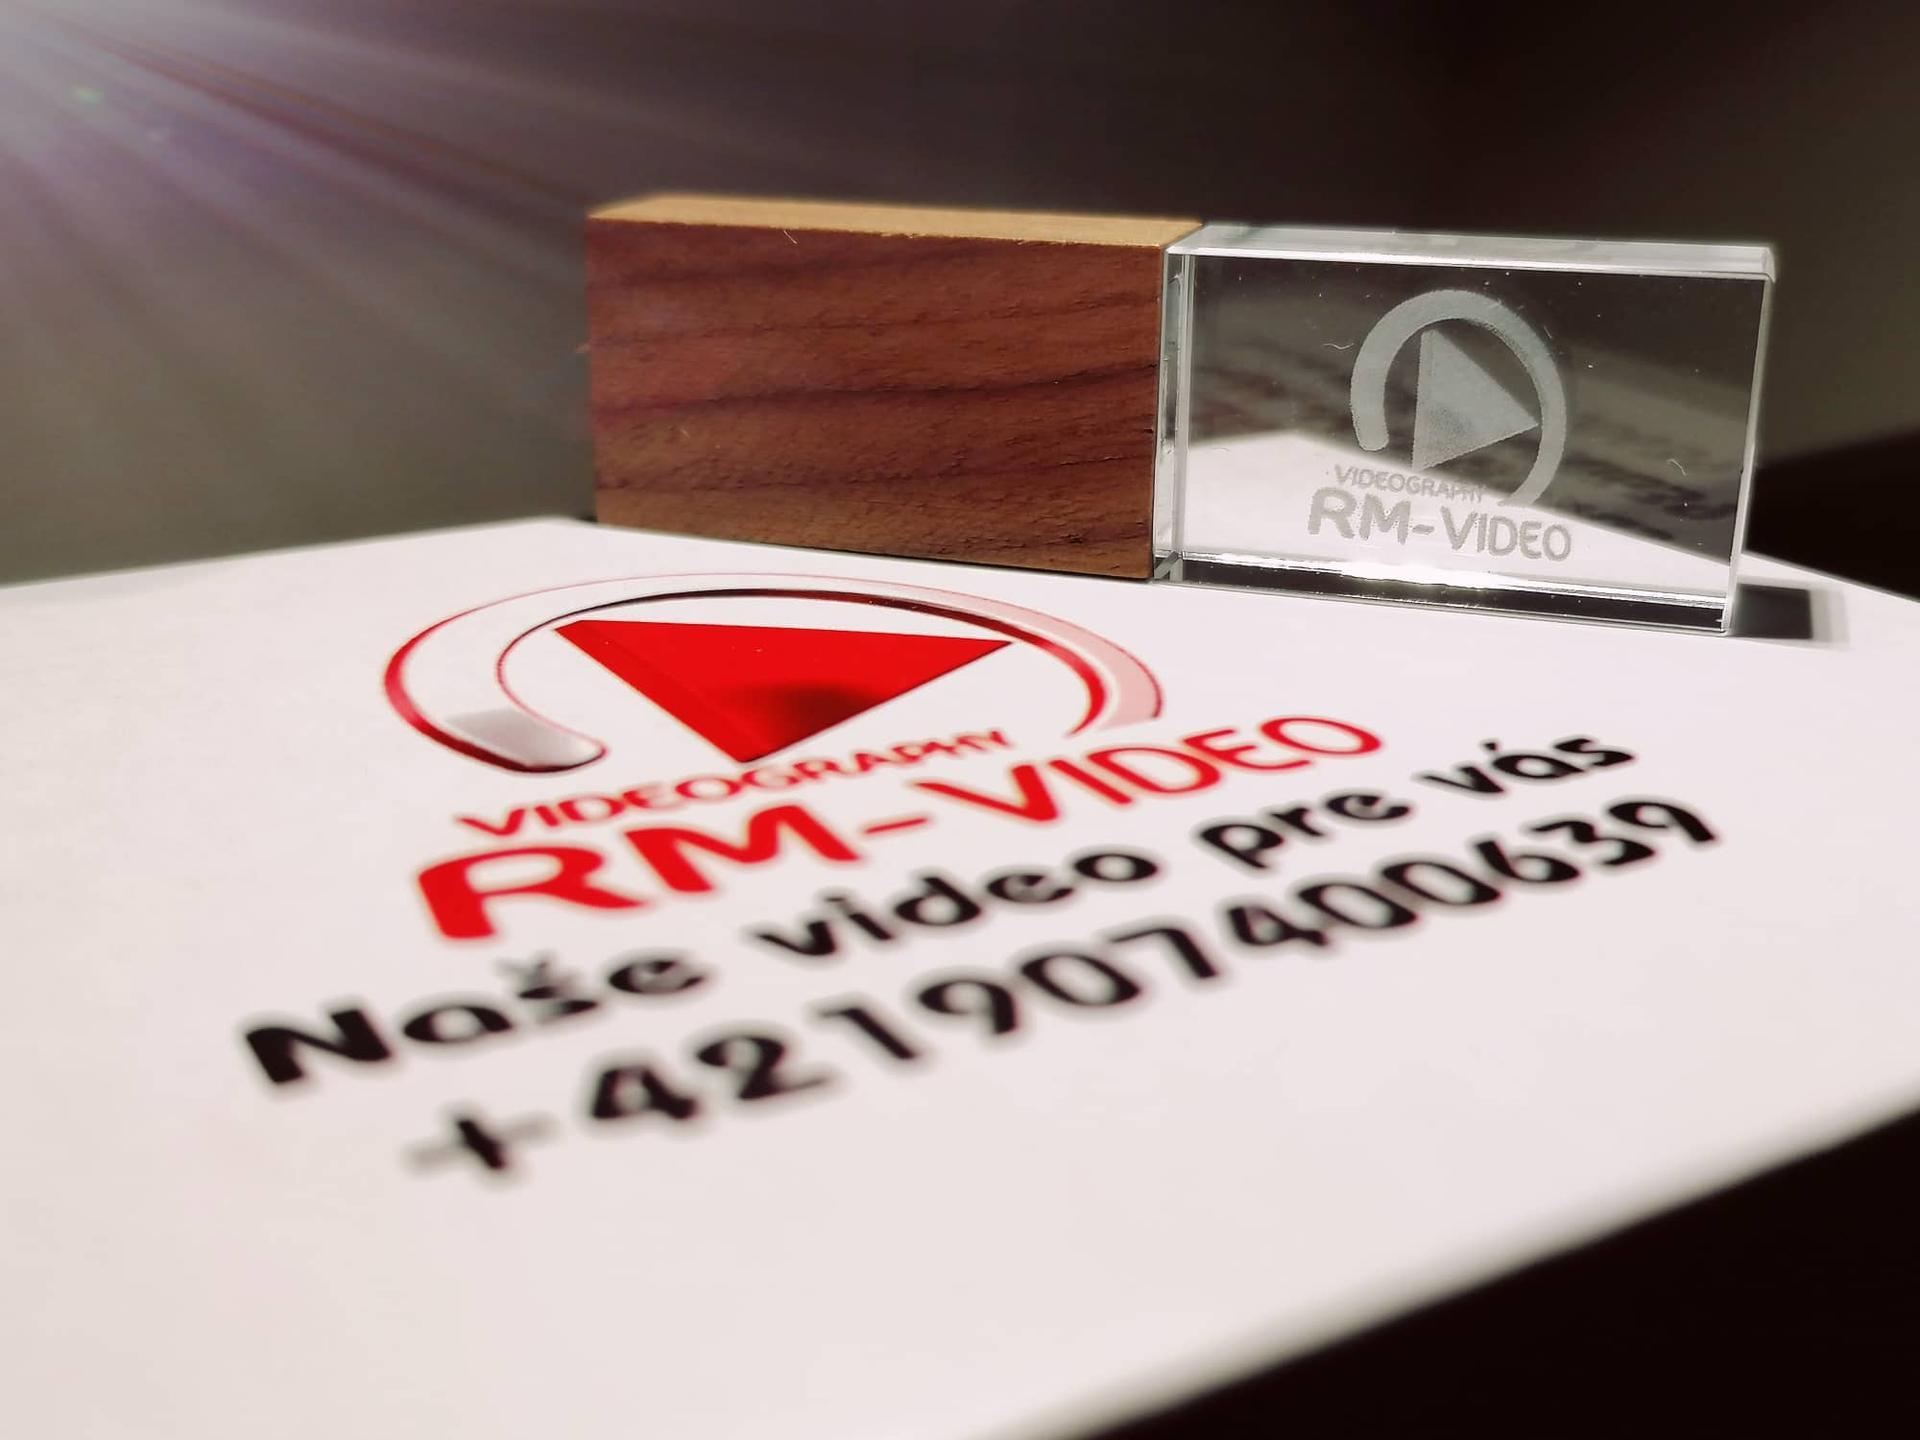 rmvideo - Obrázok č. 8